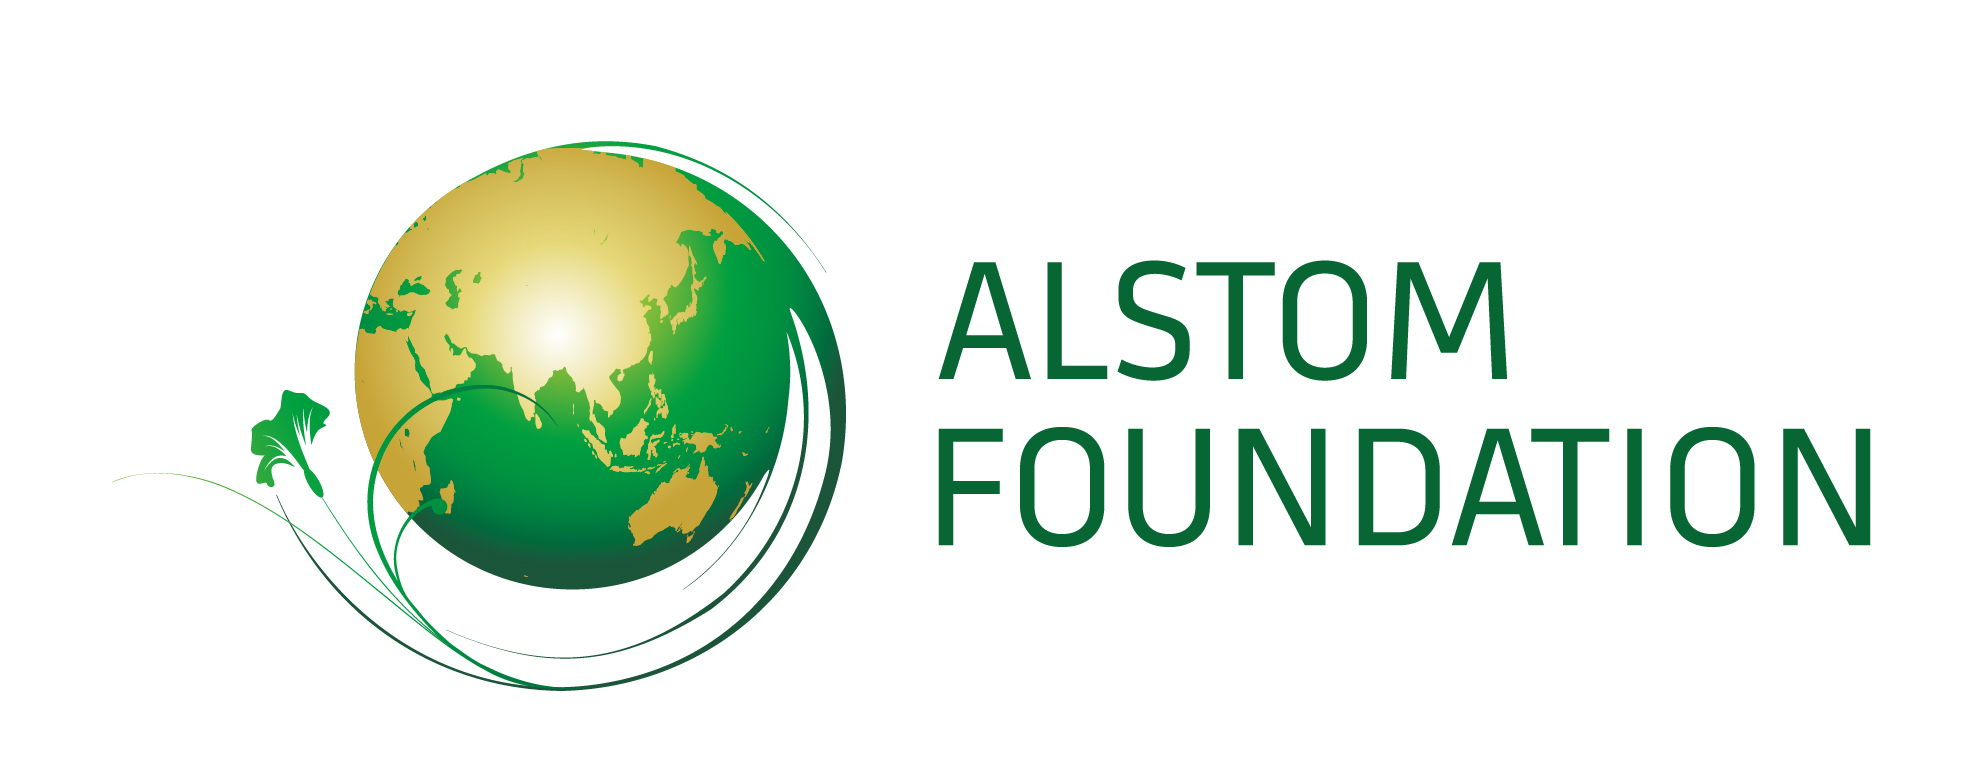 Fondation Alstom